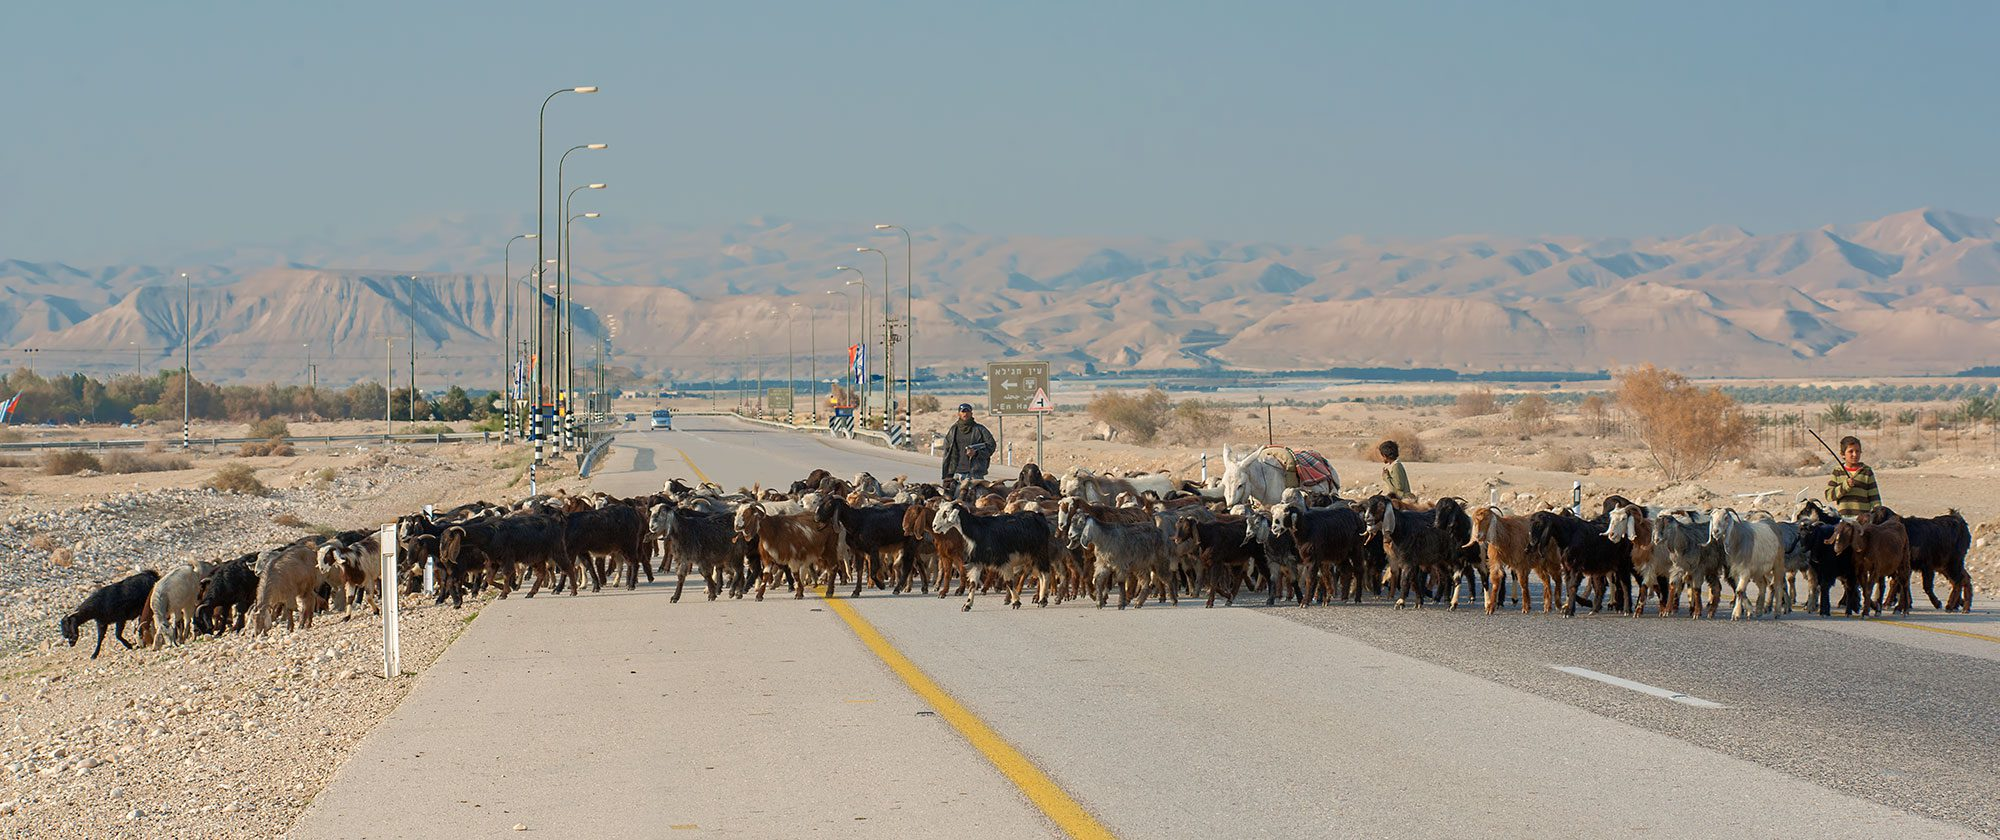 Near Jericho, Israel